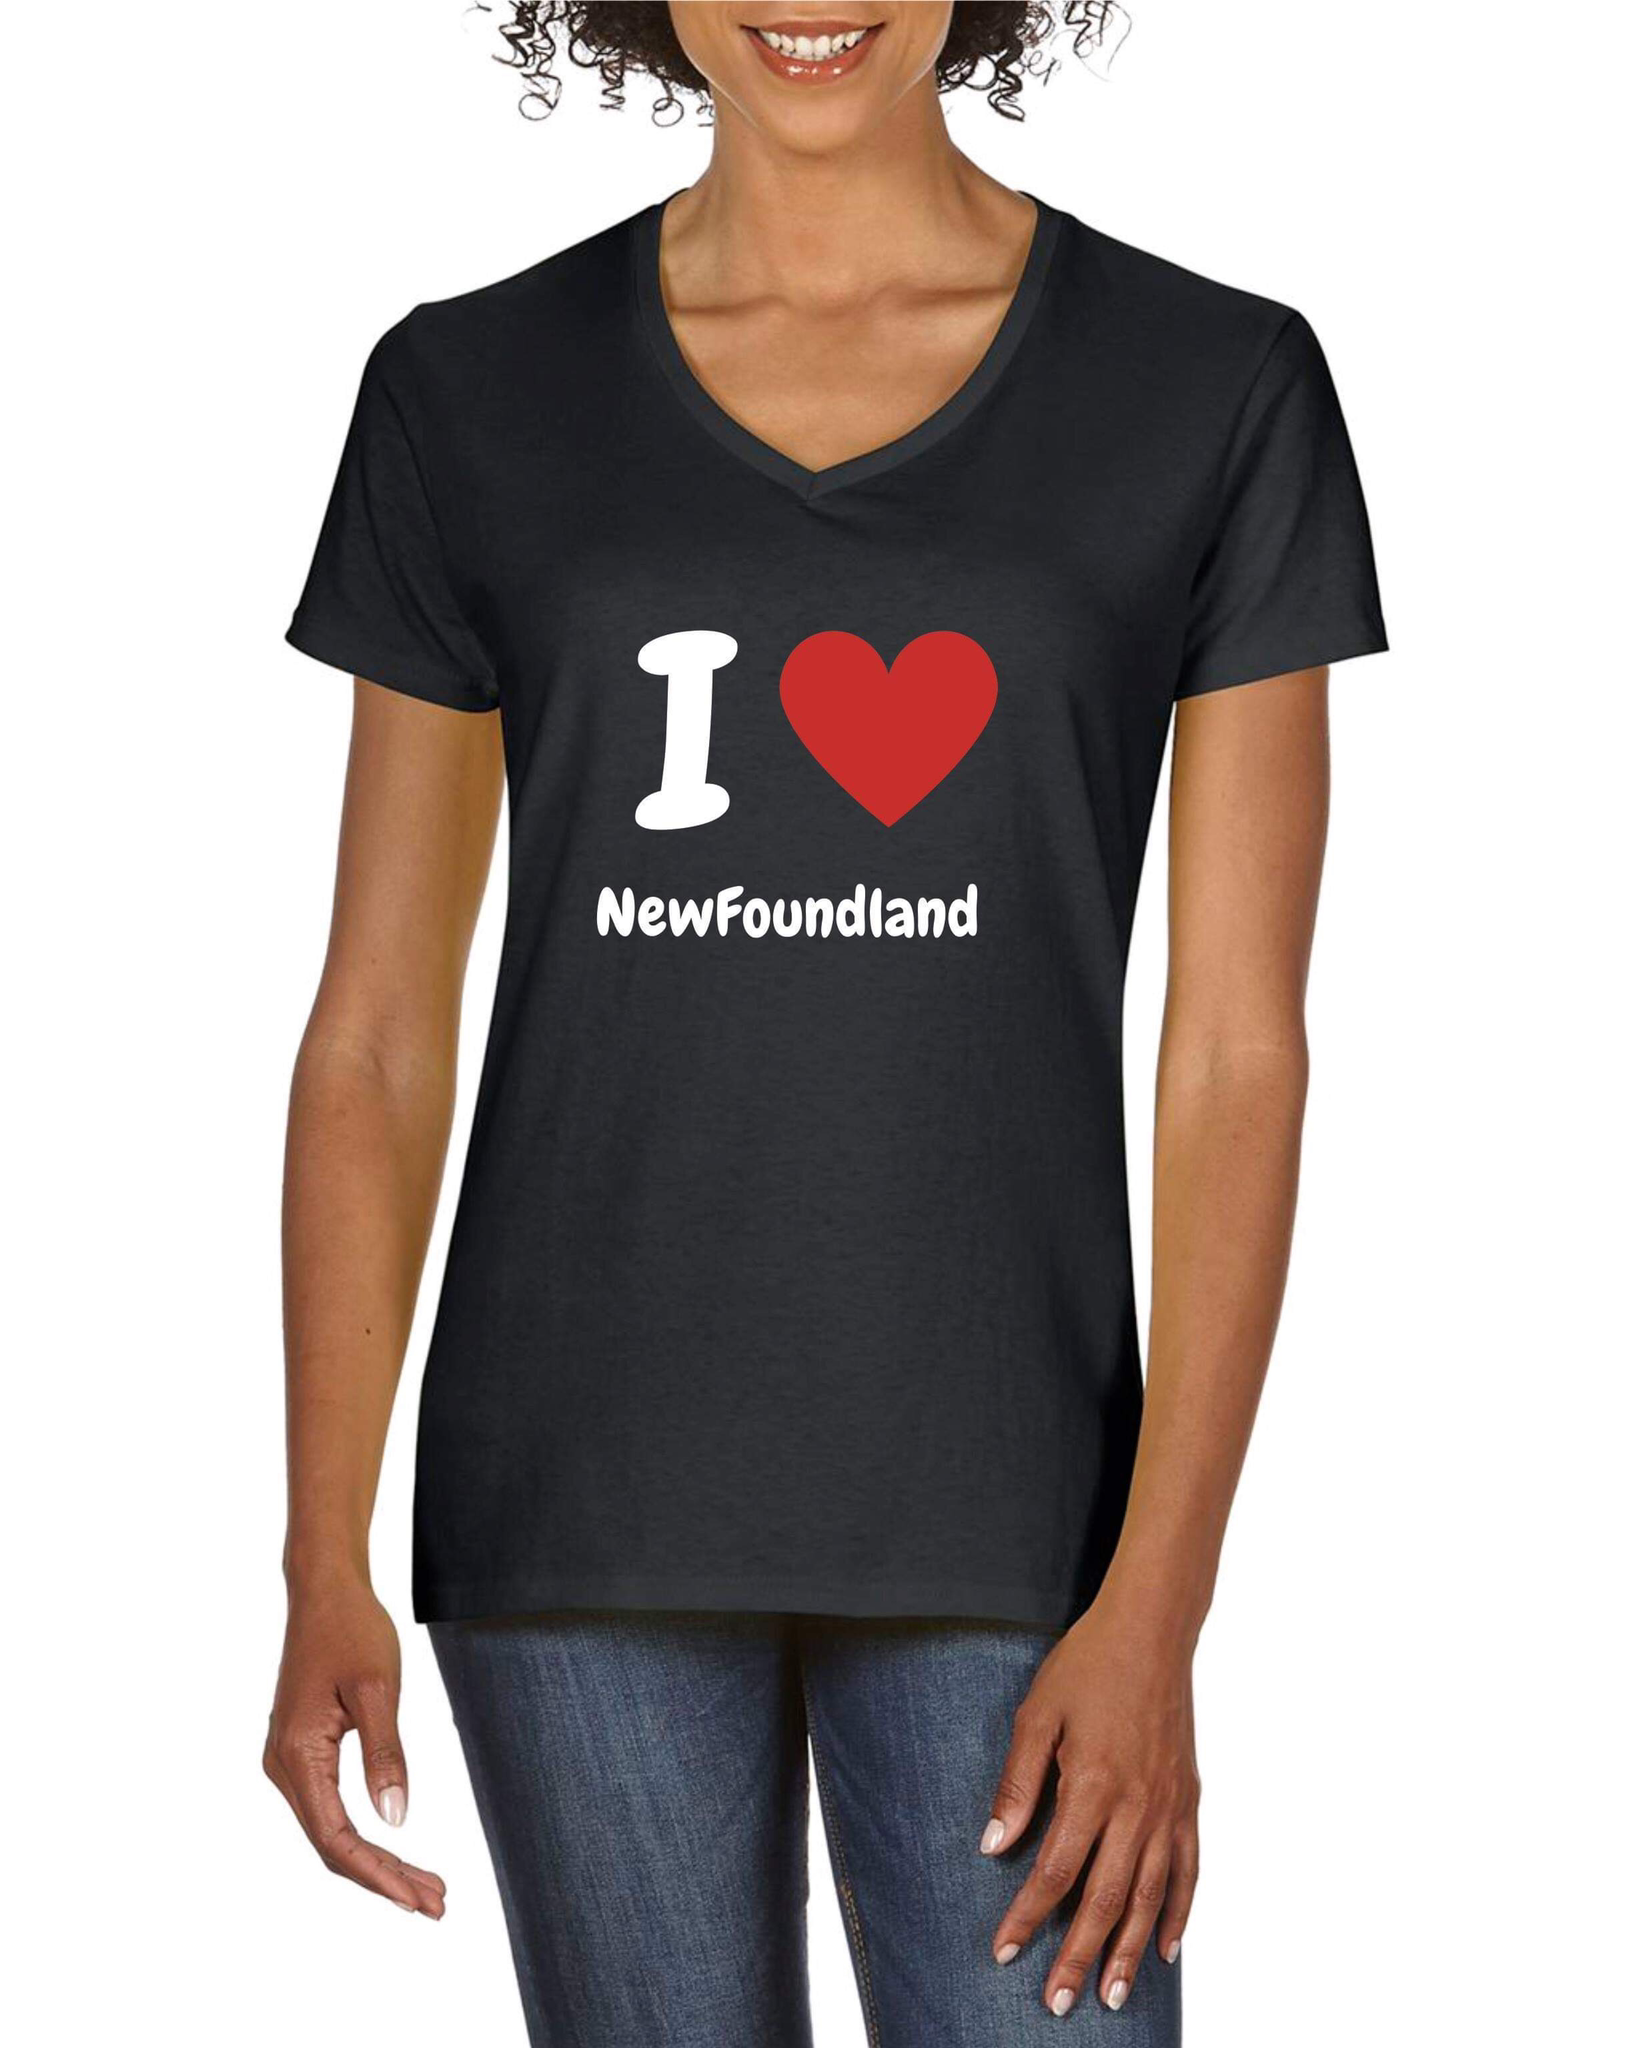 Női póló - V-nyakú - fekete - Újfoundlandi